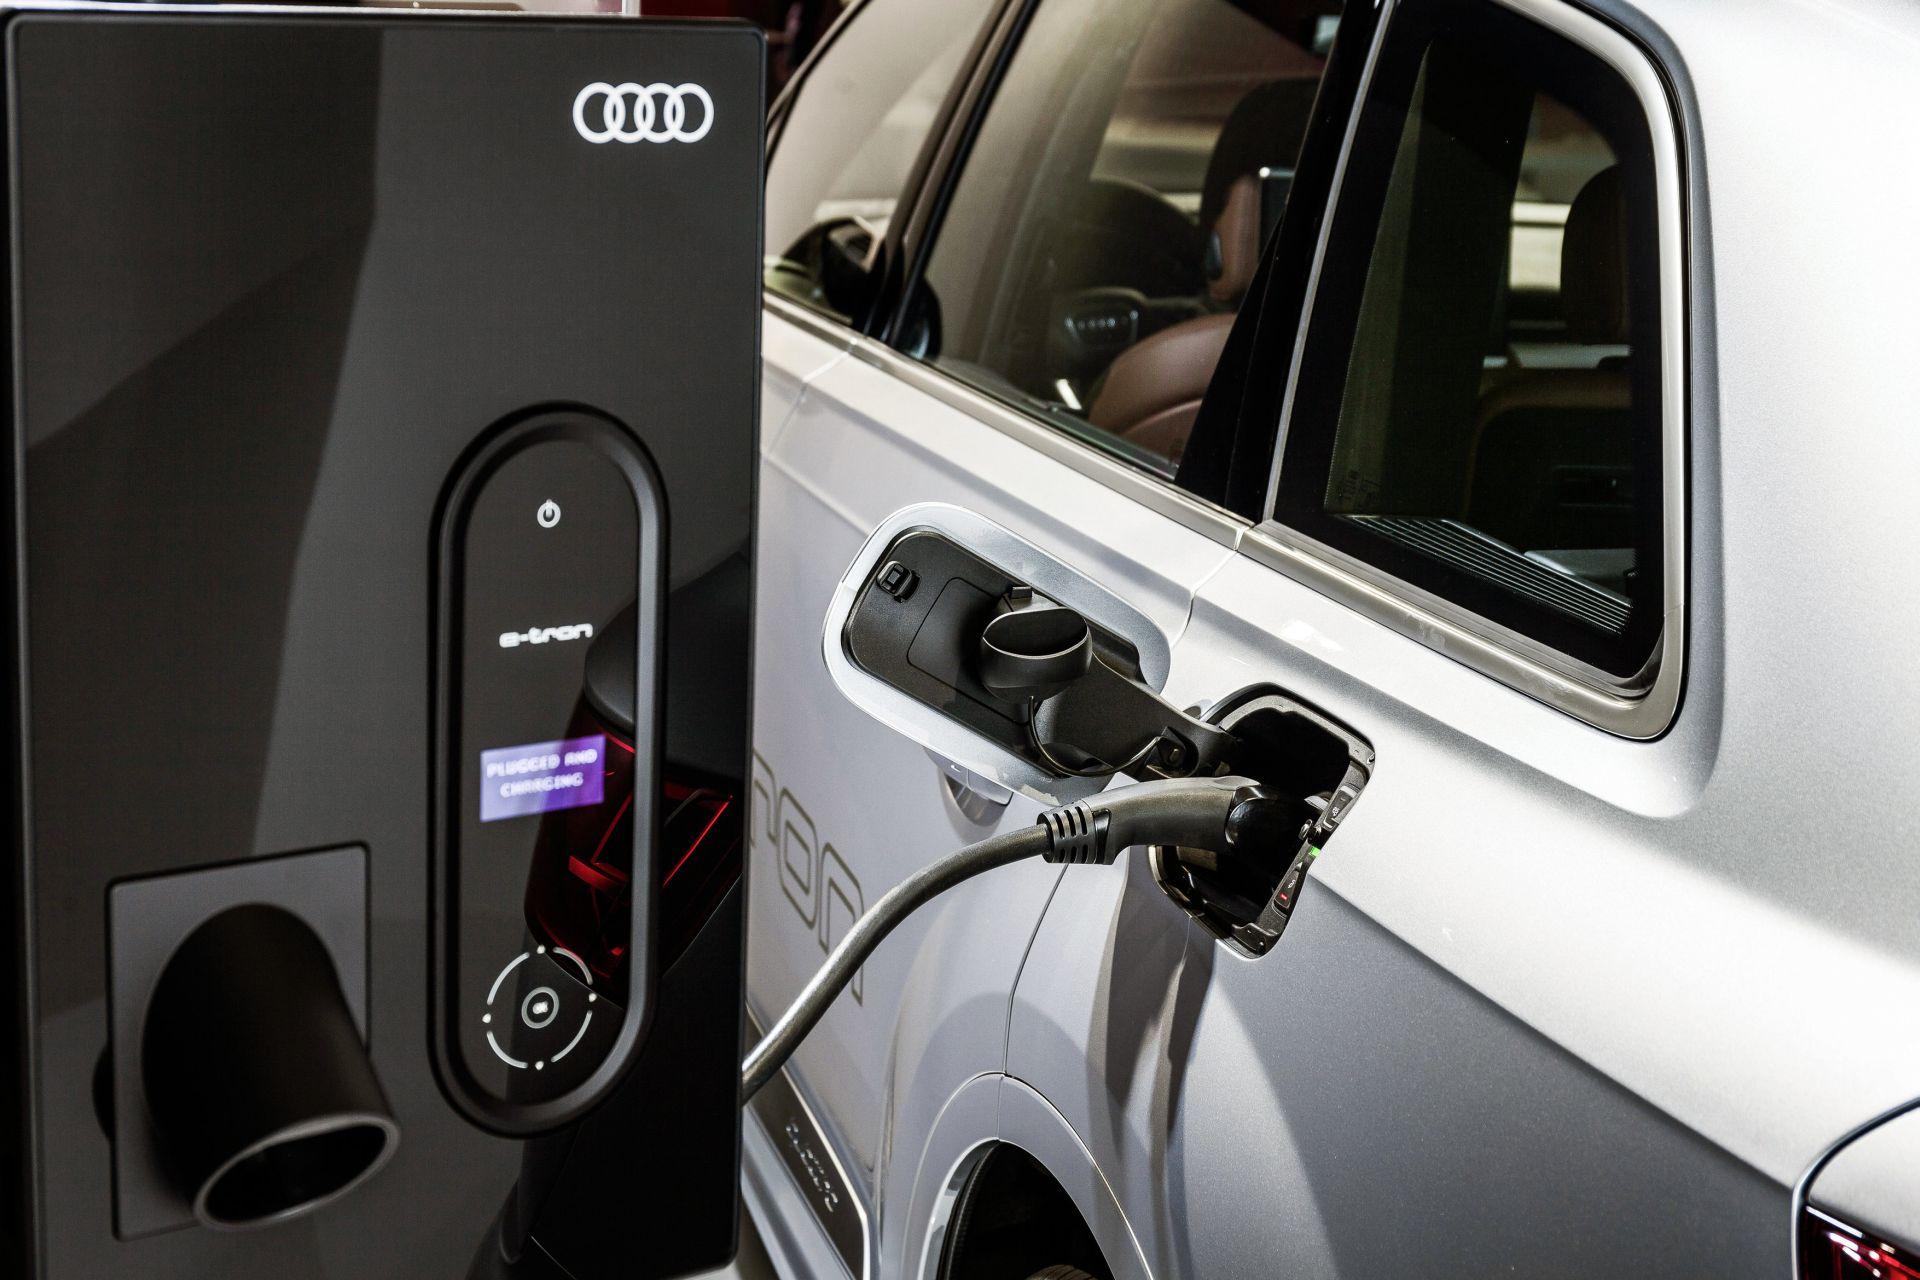 Audi Q7 e-tron 3.0 TDI quattro, Wallbox with control panel, electric charging